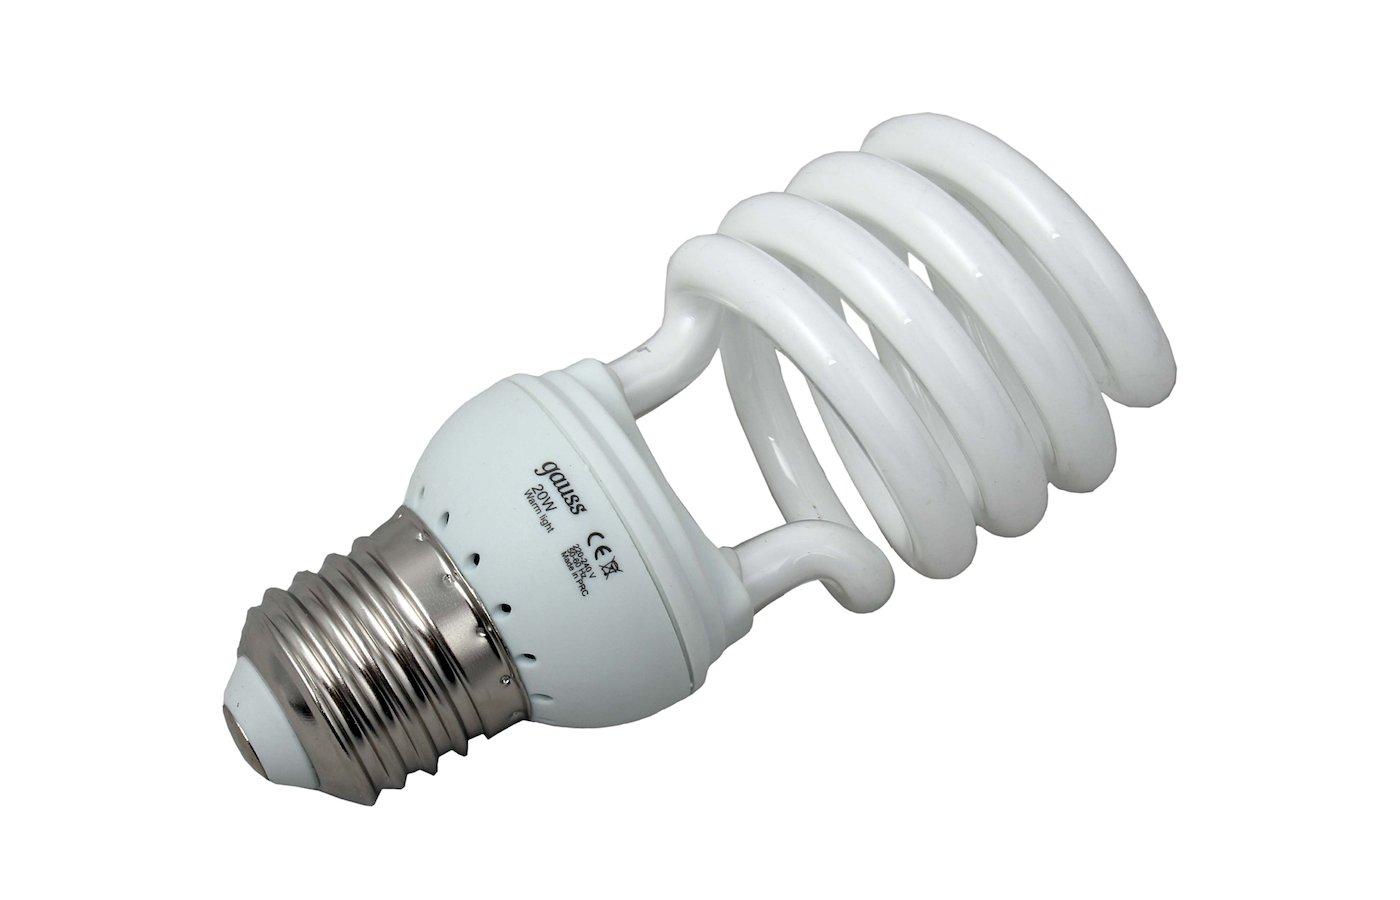 Лампочки энергосберегающие Gauss Spiral T2 20W 2700K E27